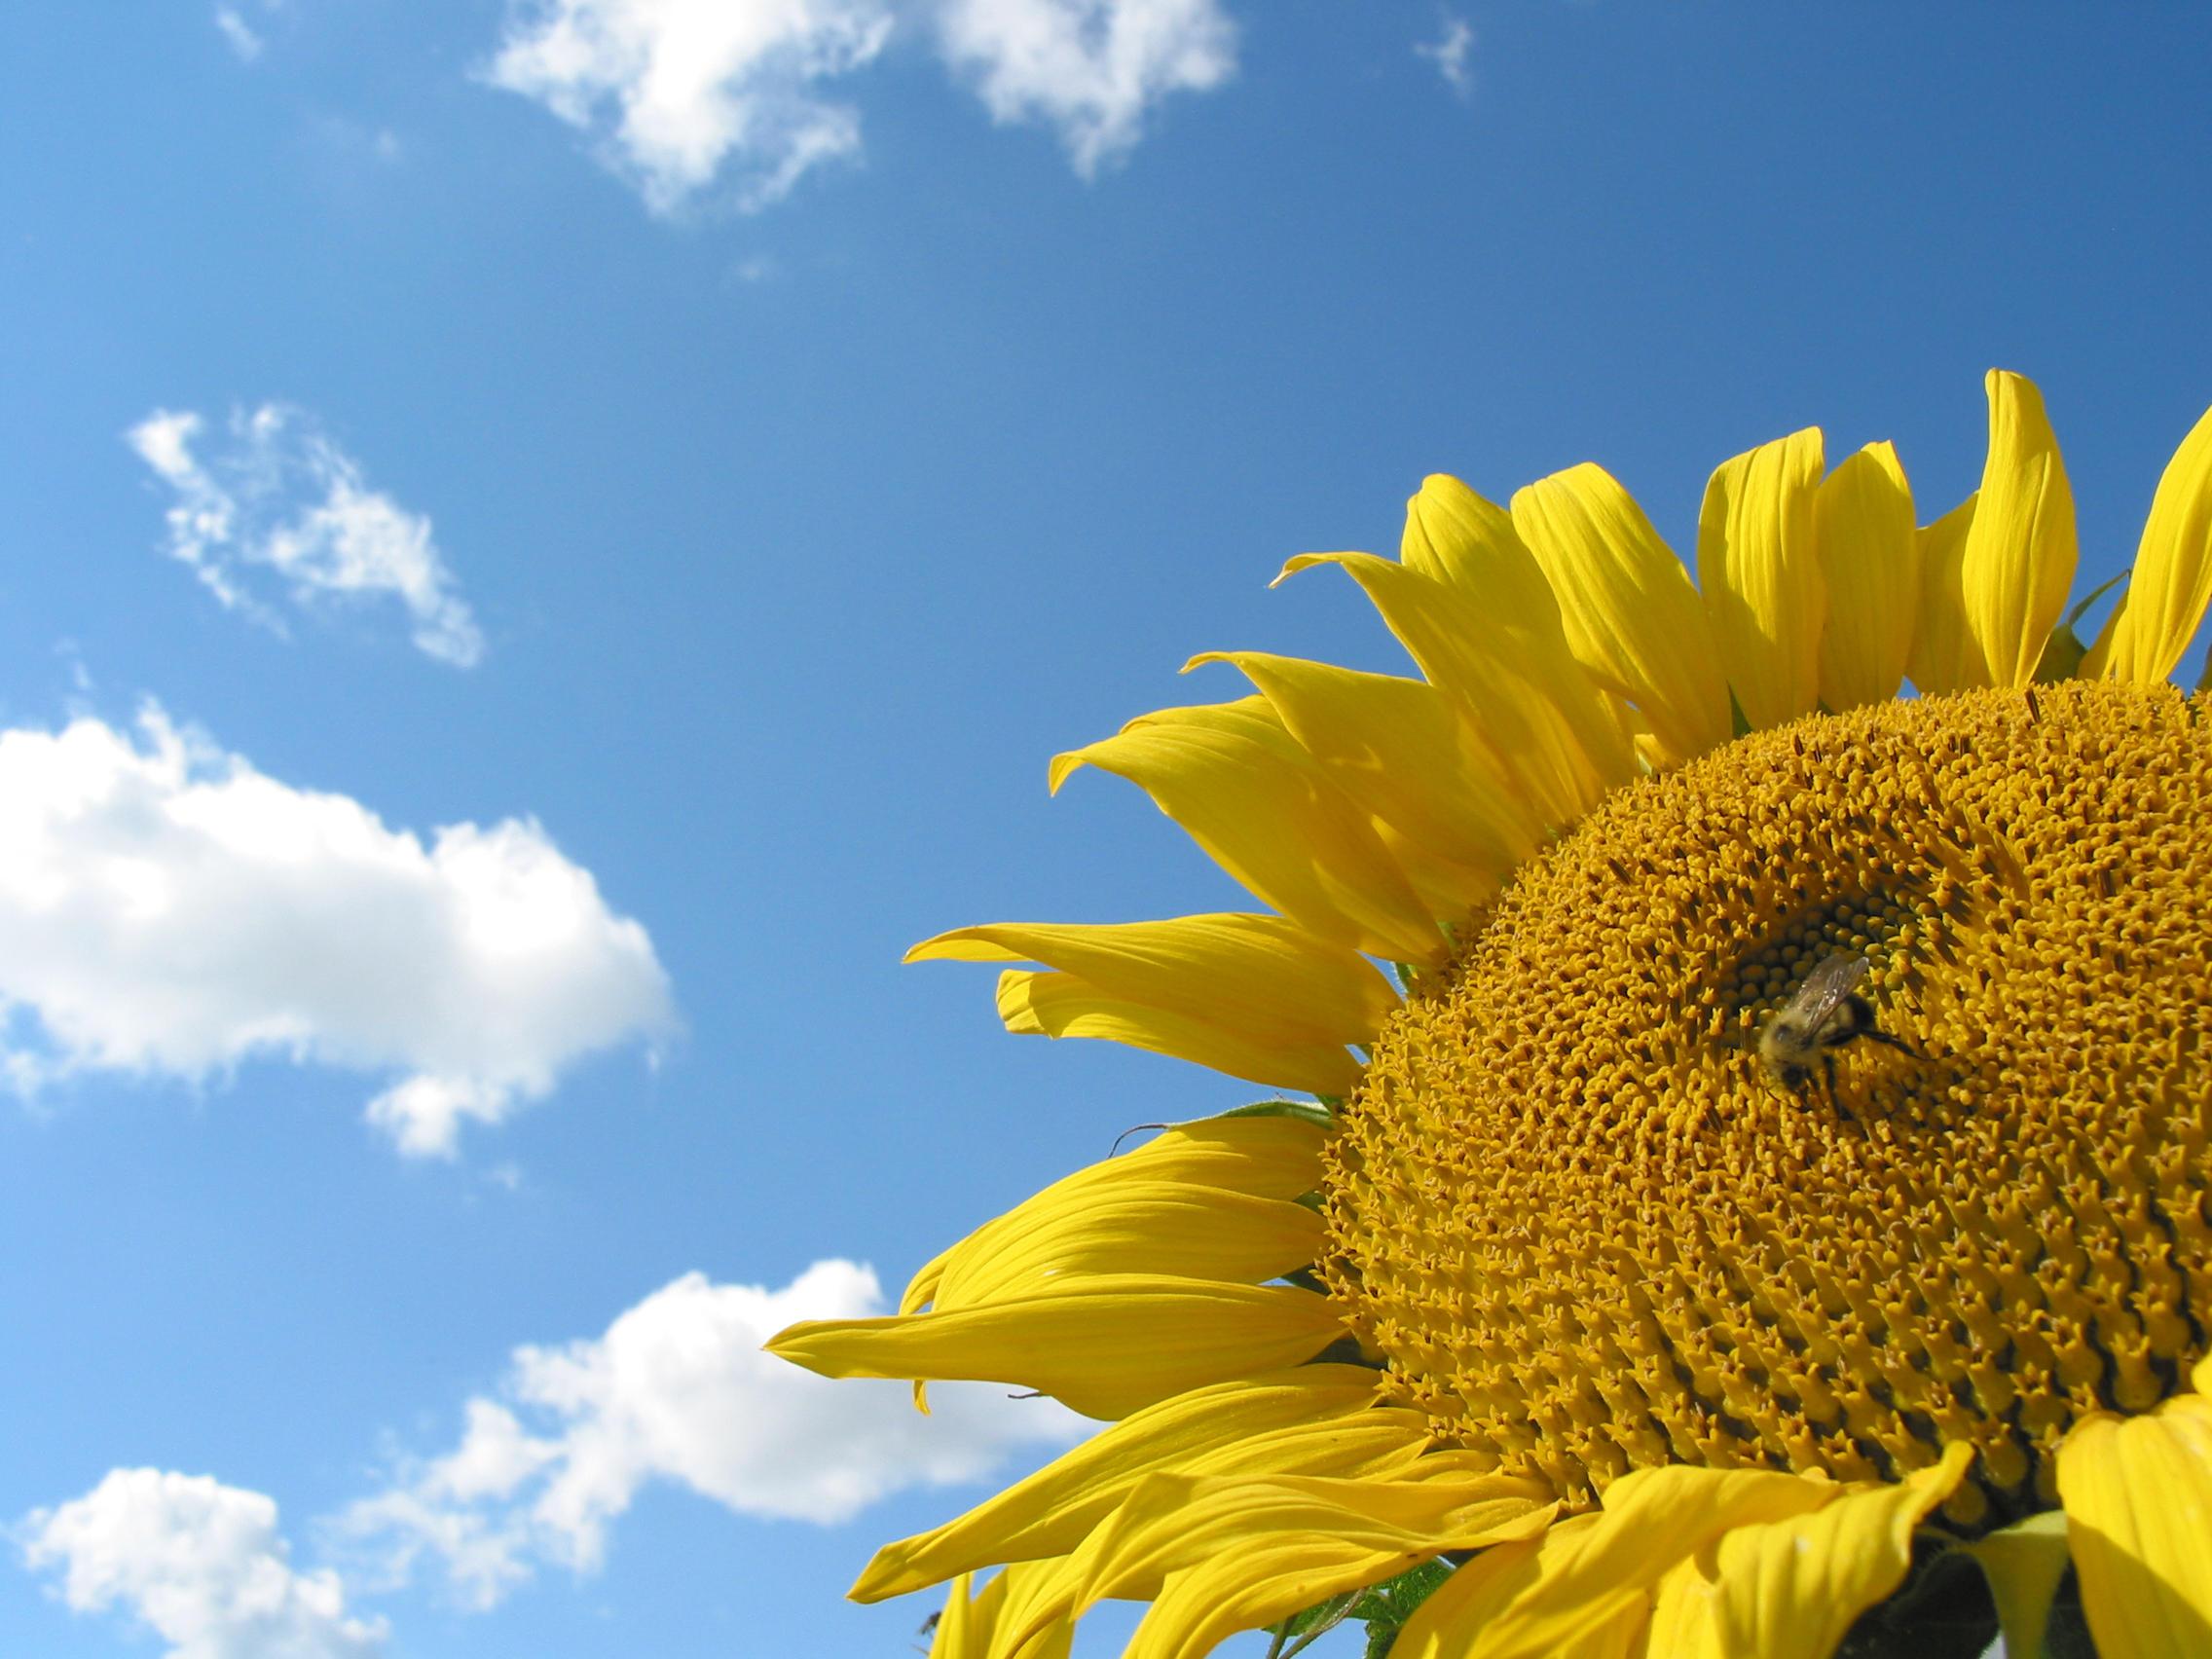 g2-sunflower-2 by zinux